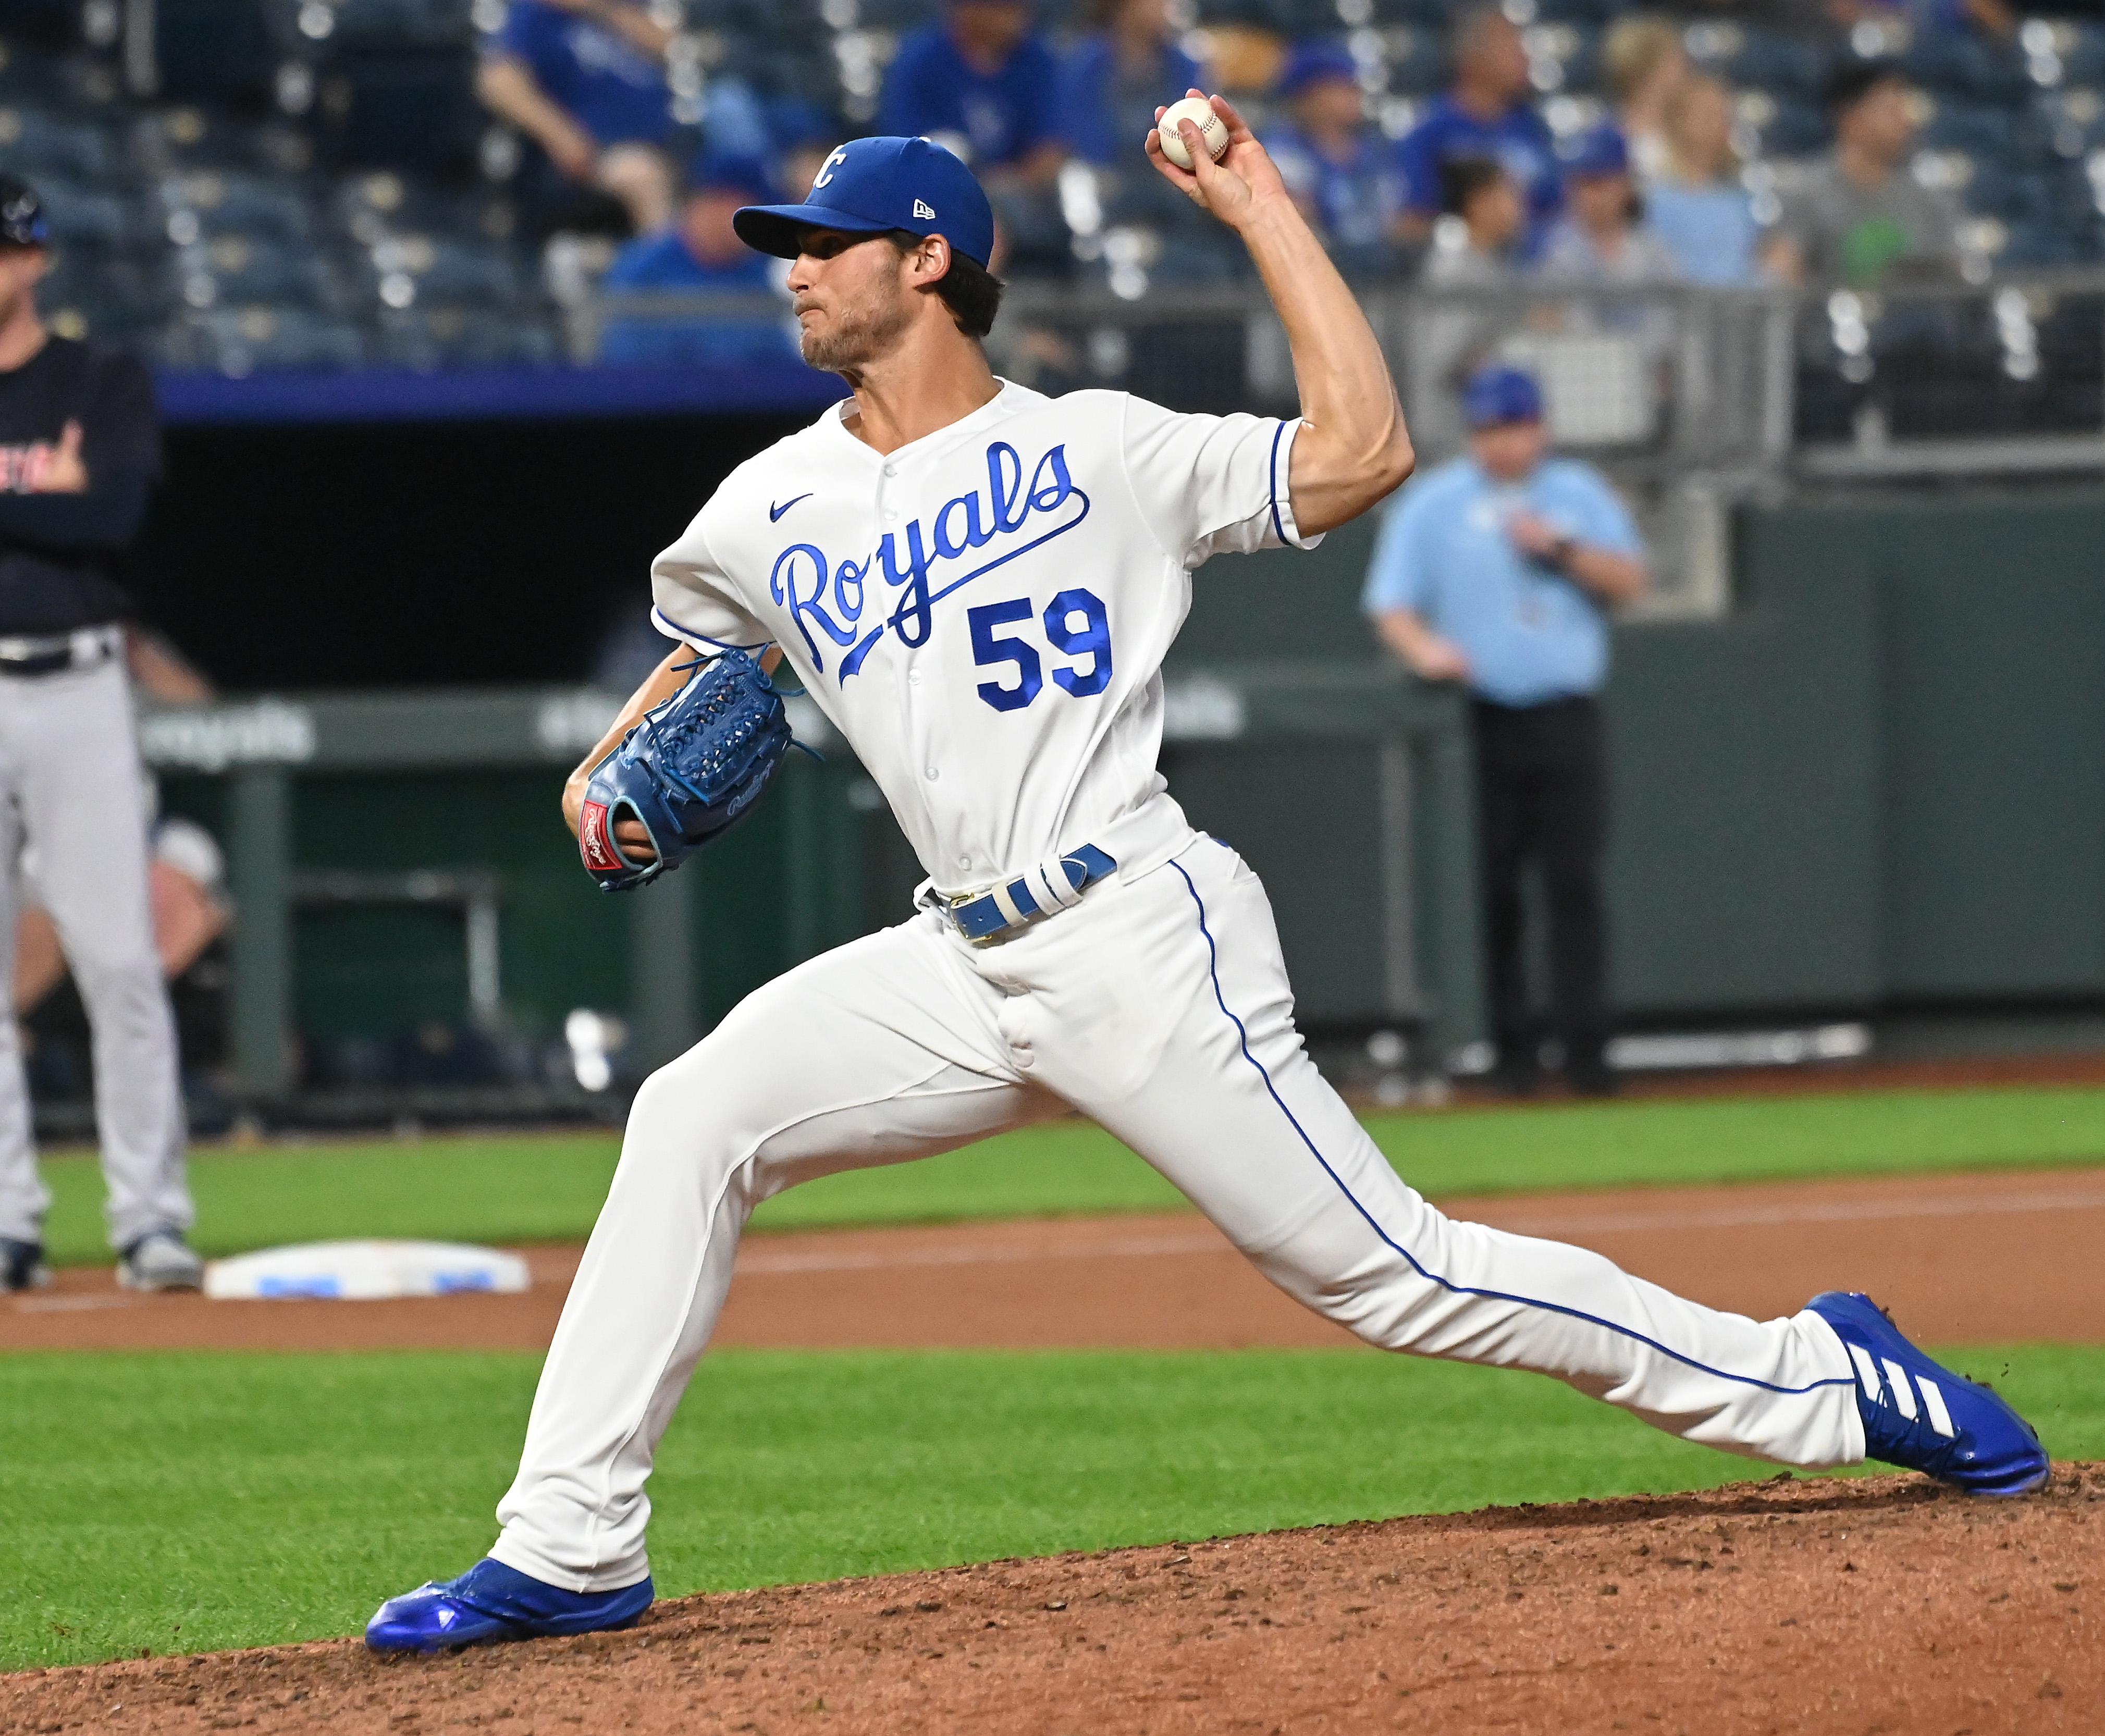 Jake Brentz throws a pitch